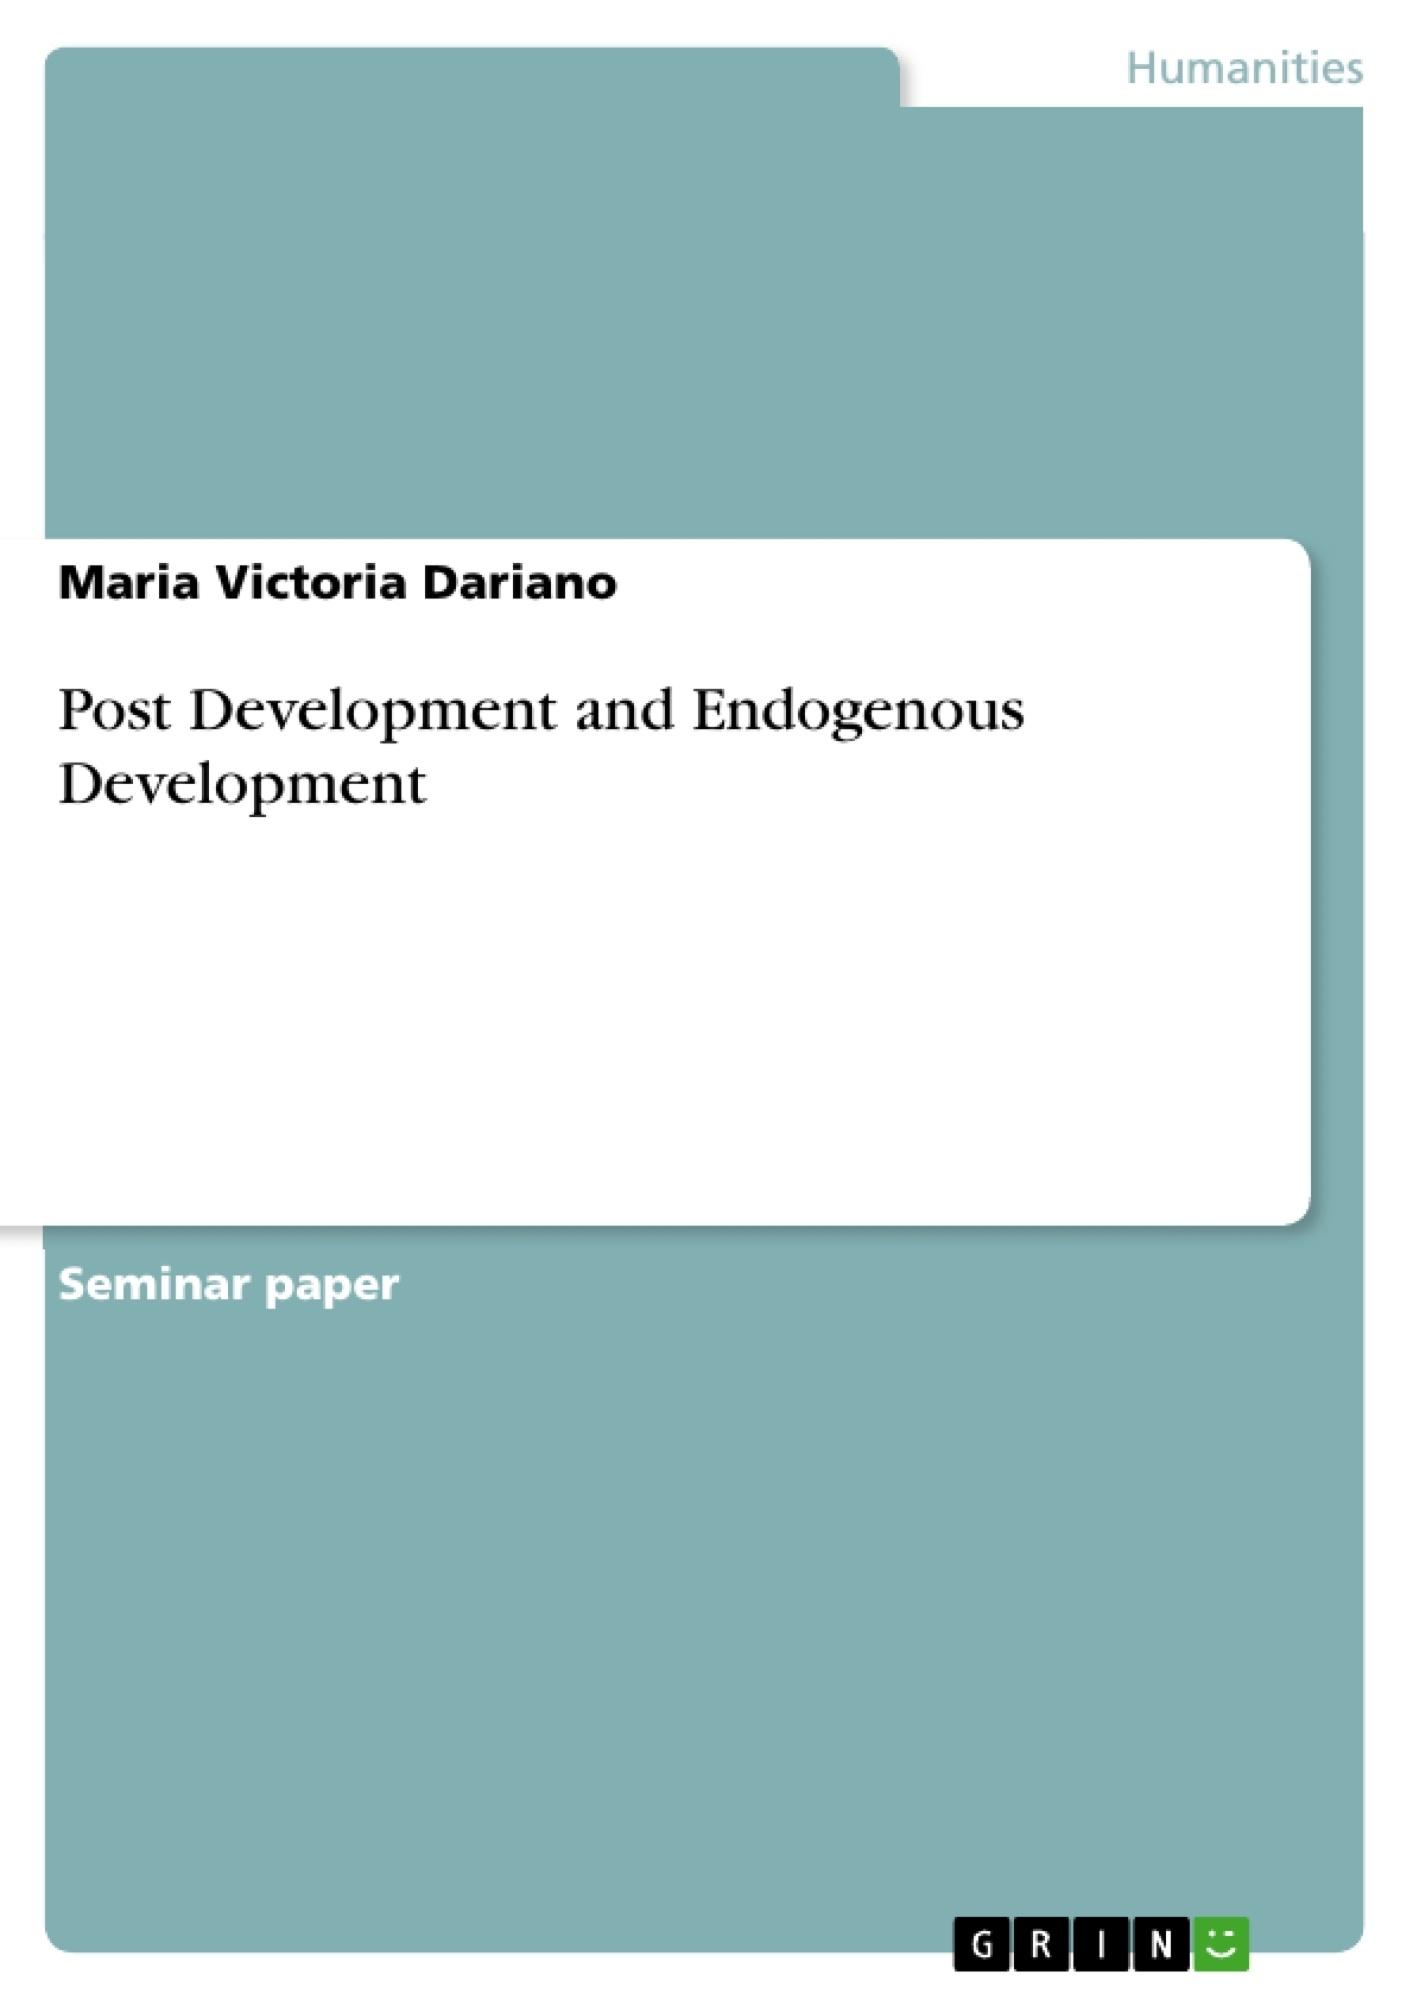 Title: Post Development and Endogenous Development